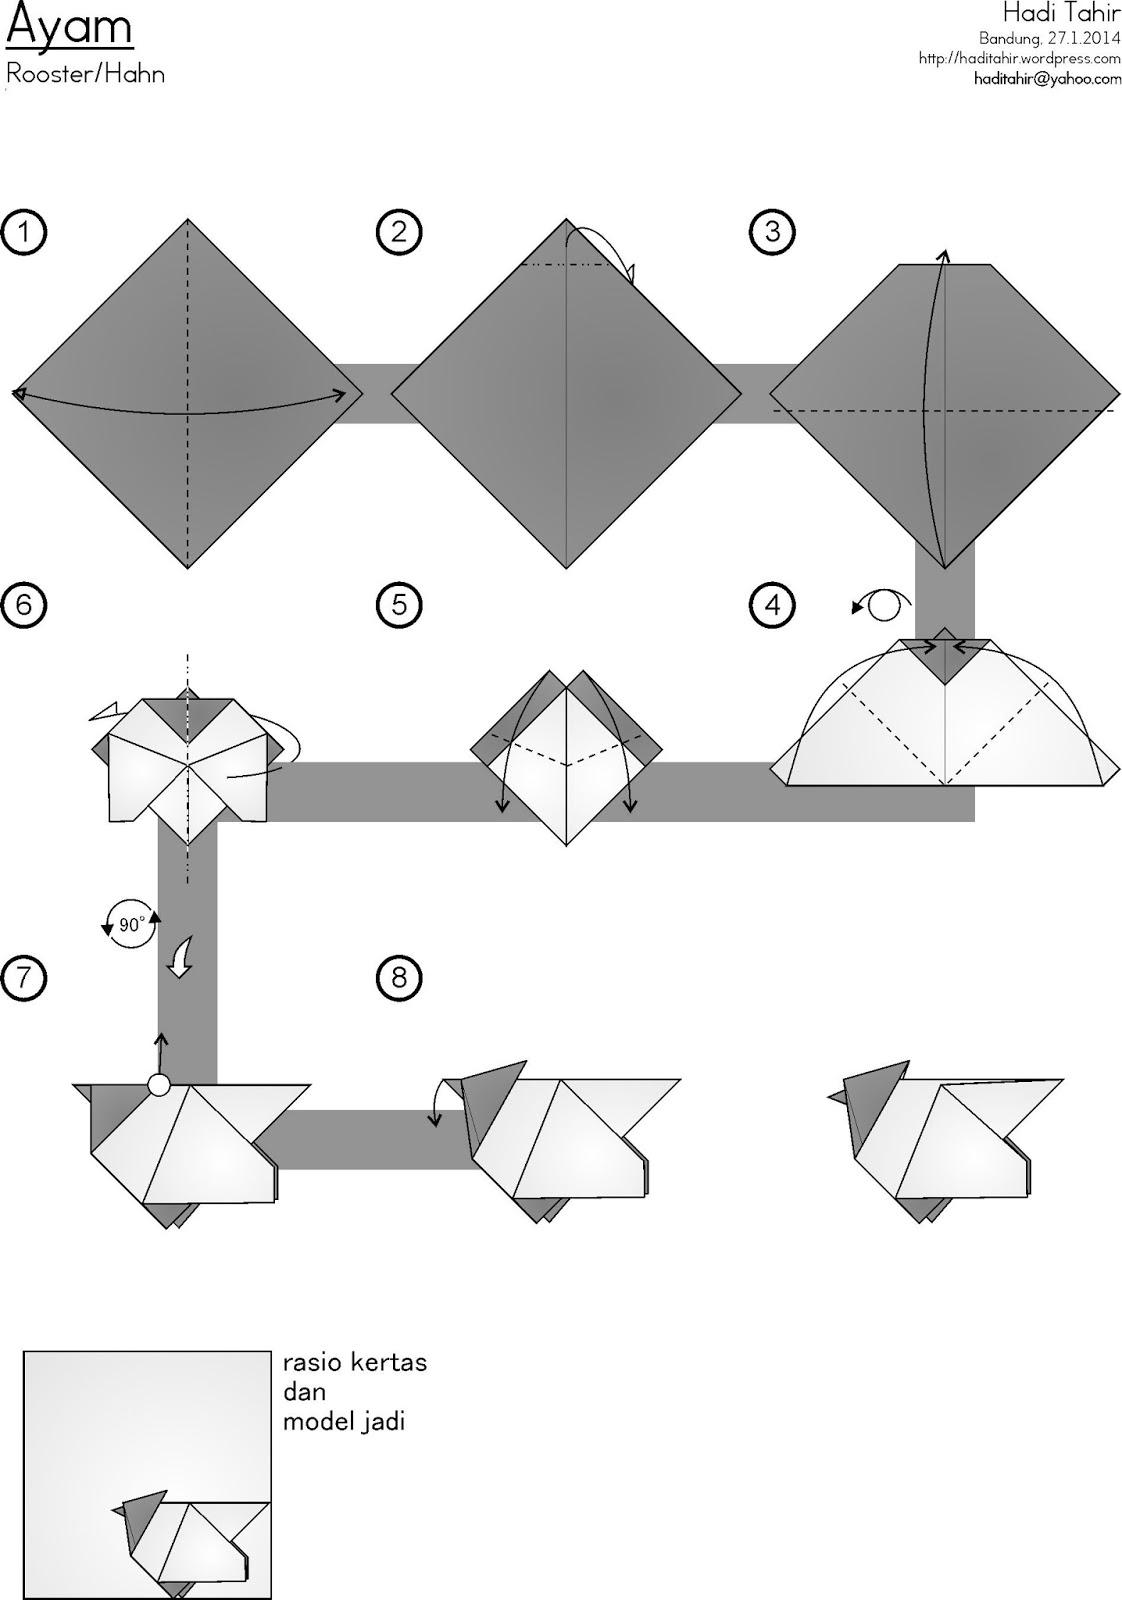 Tutorial Origami Ayam Sederhana Easy Rooster